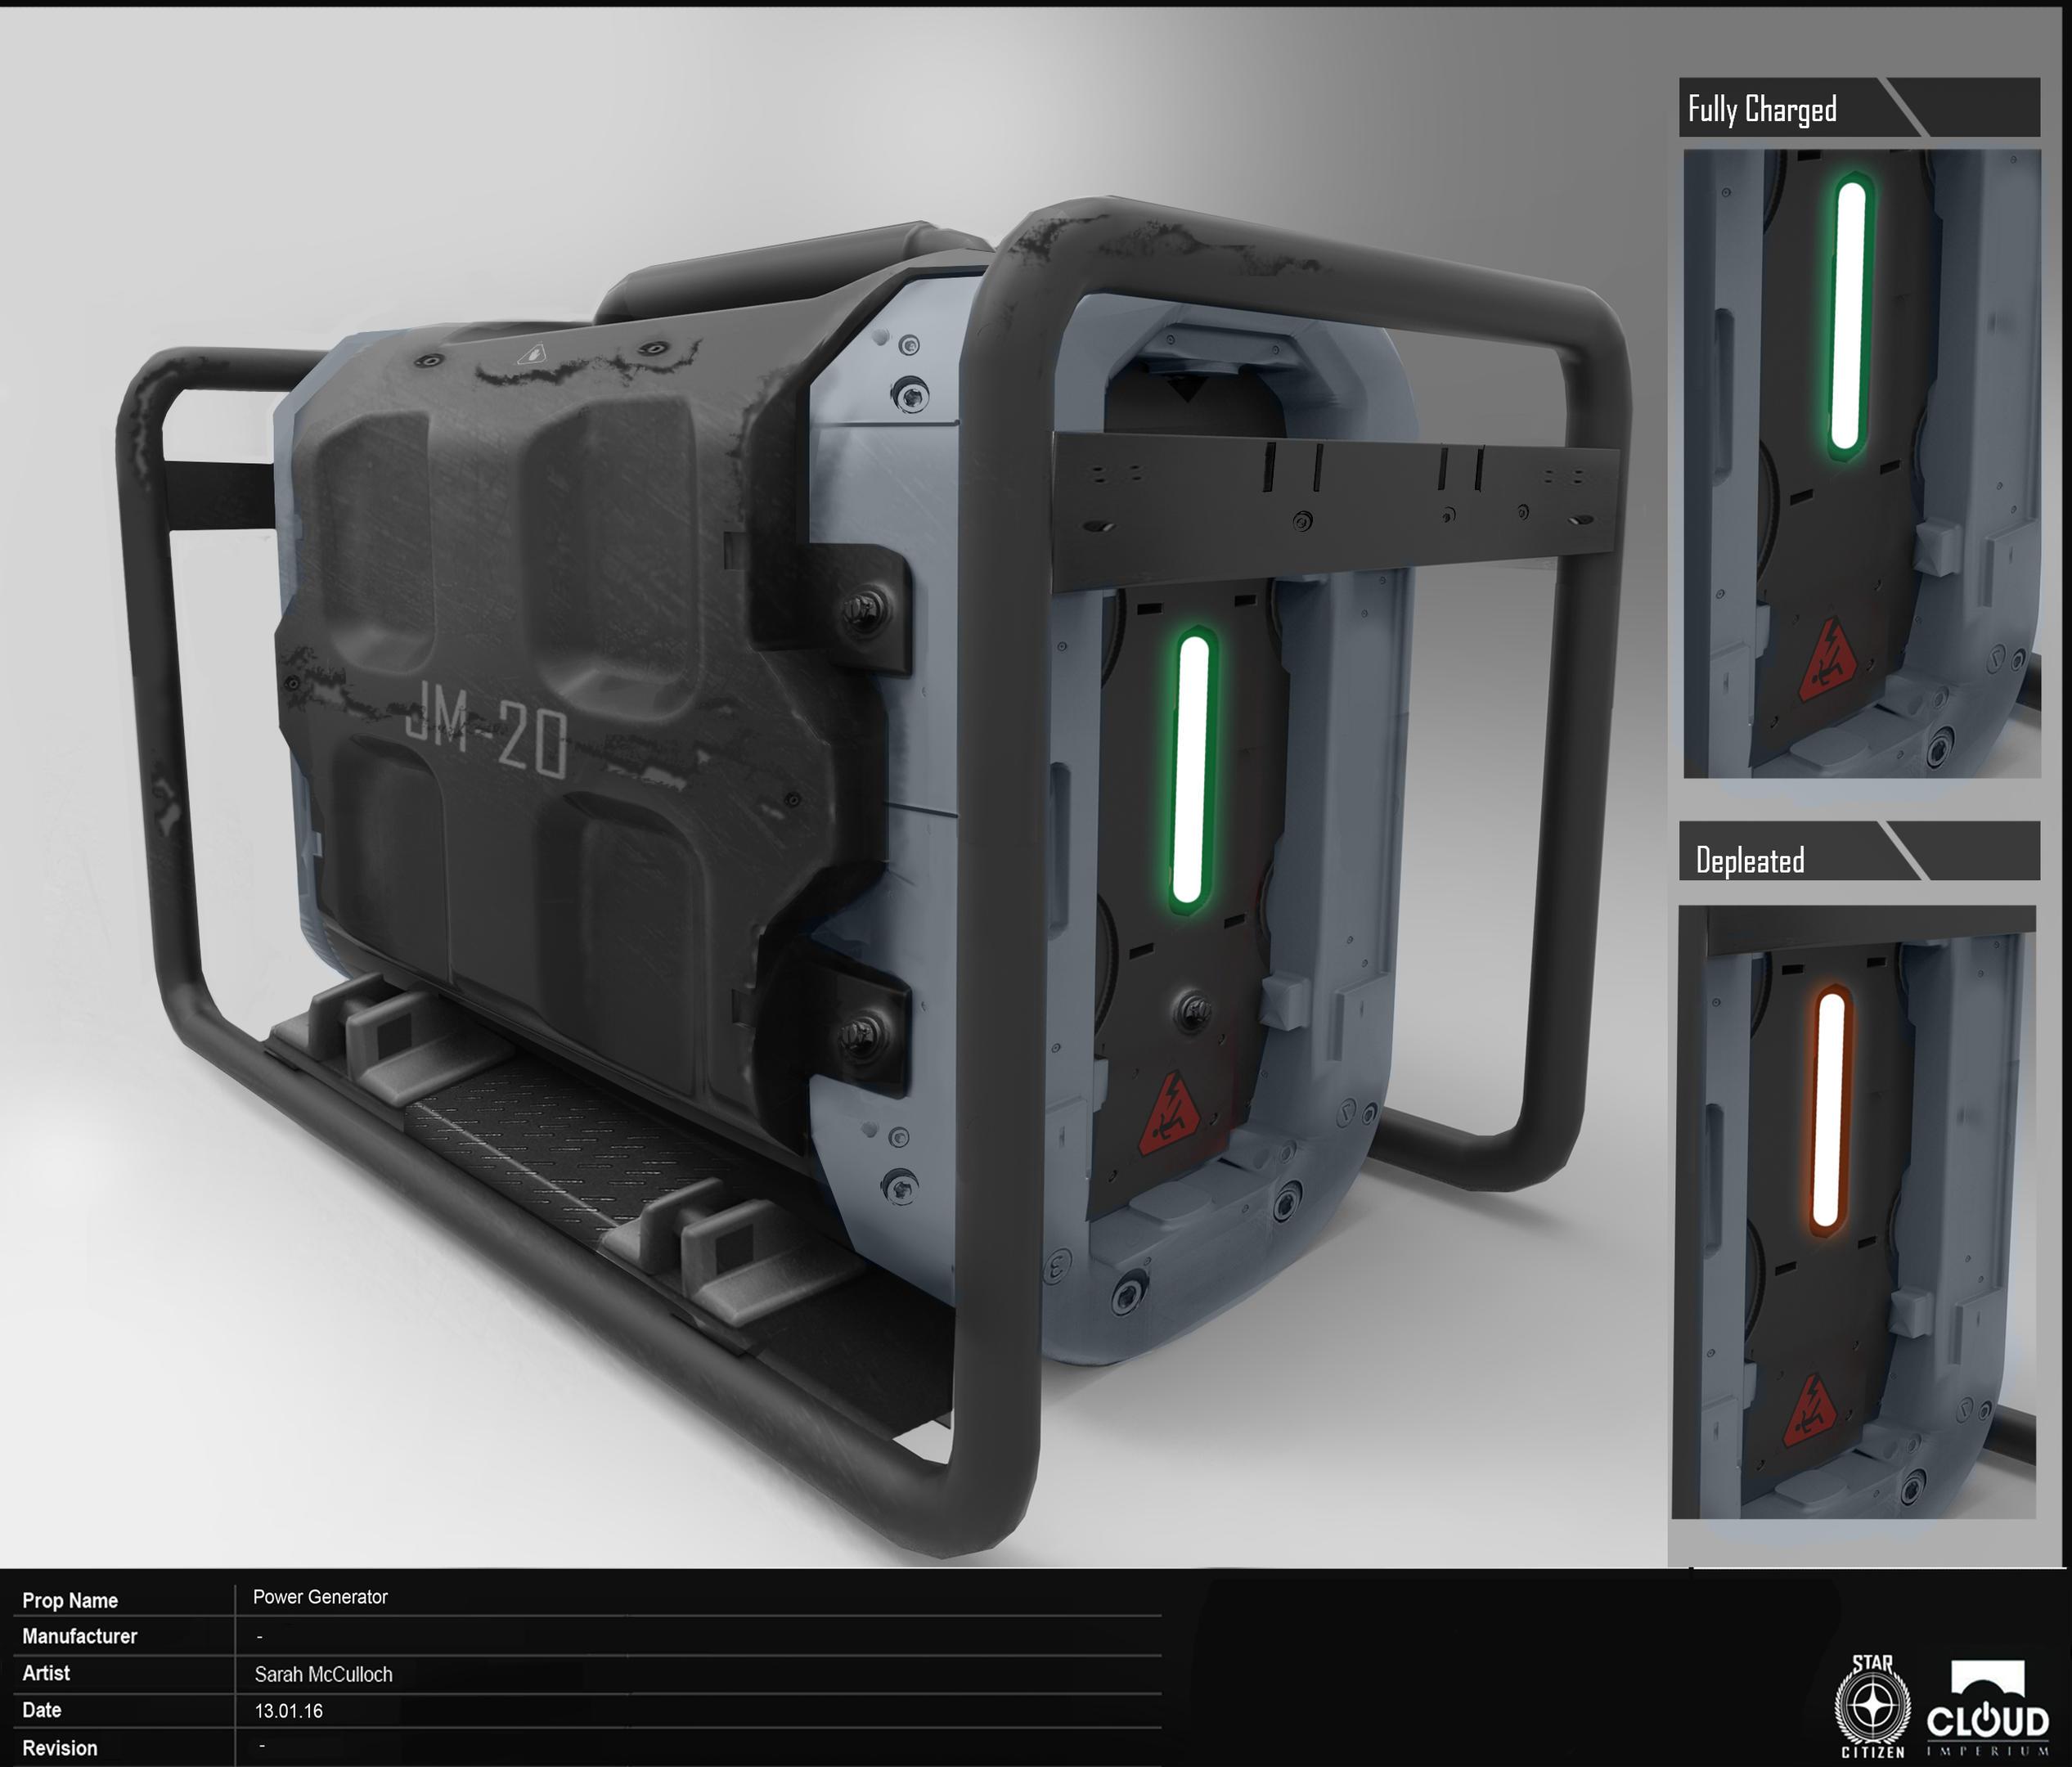 Power generator - Komponenty